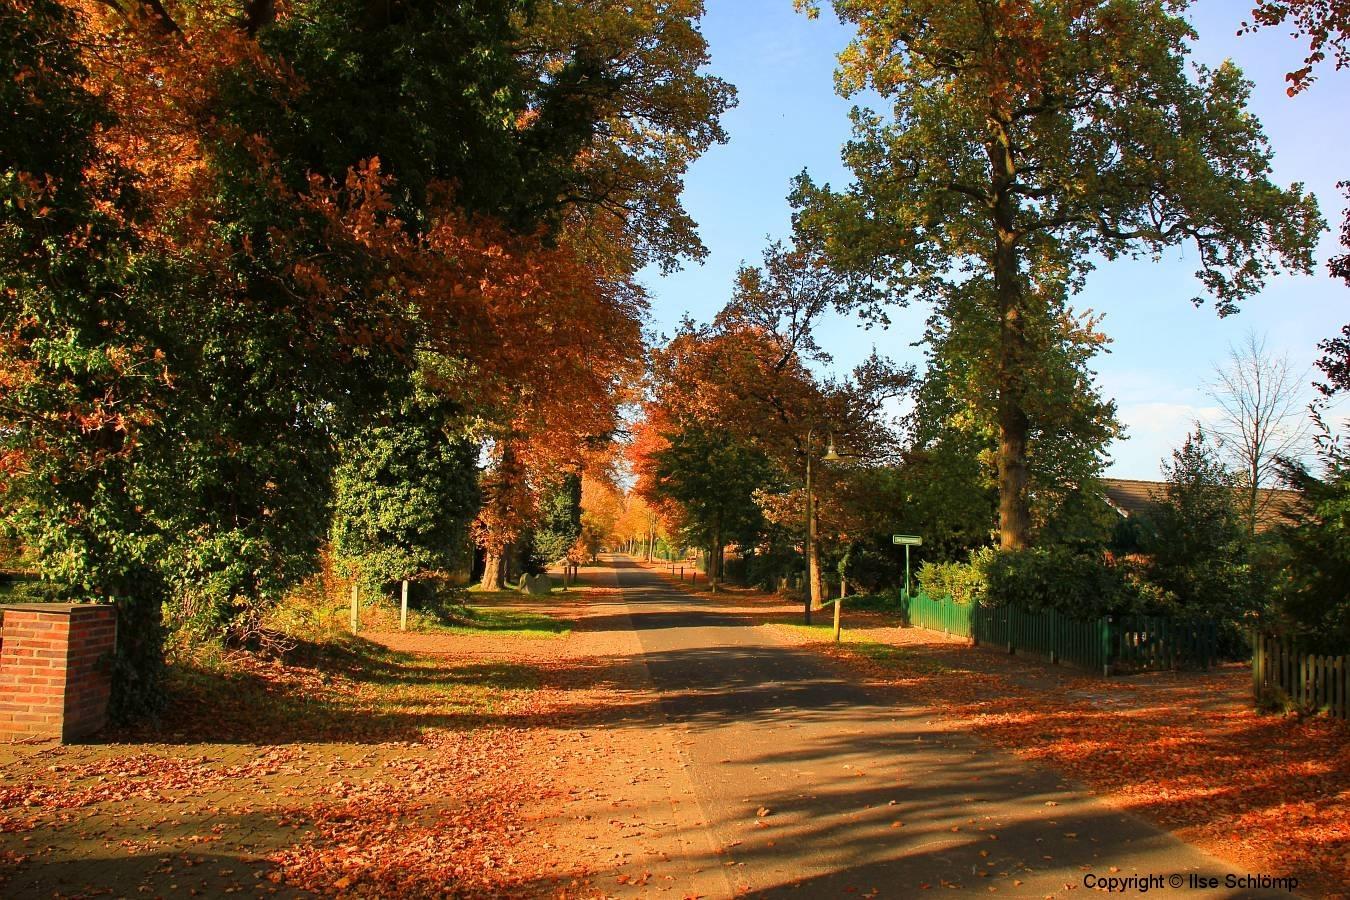 Cuxland, Stinstedt, Herbstfärbung in der Ringstraße, Herbst 2011